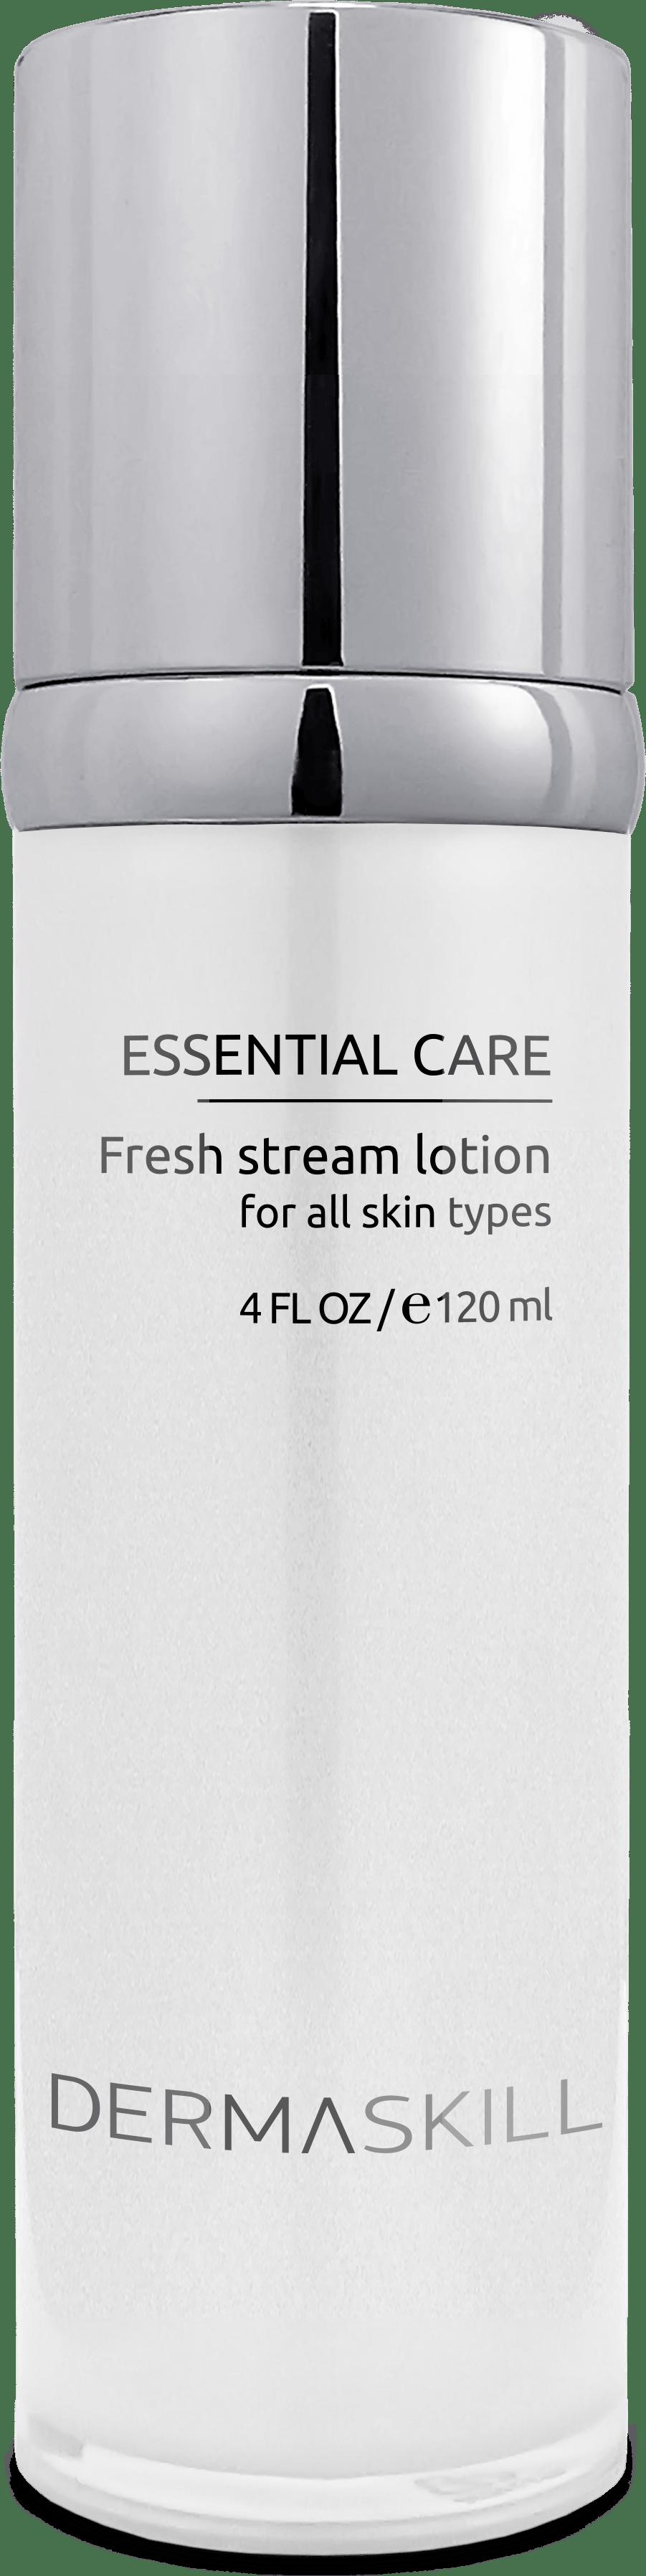 Освежающий тоник Fresh Stream Lotion Dermaskill USA 120 мл(р) — фото №1